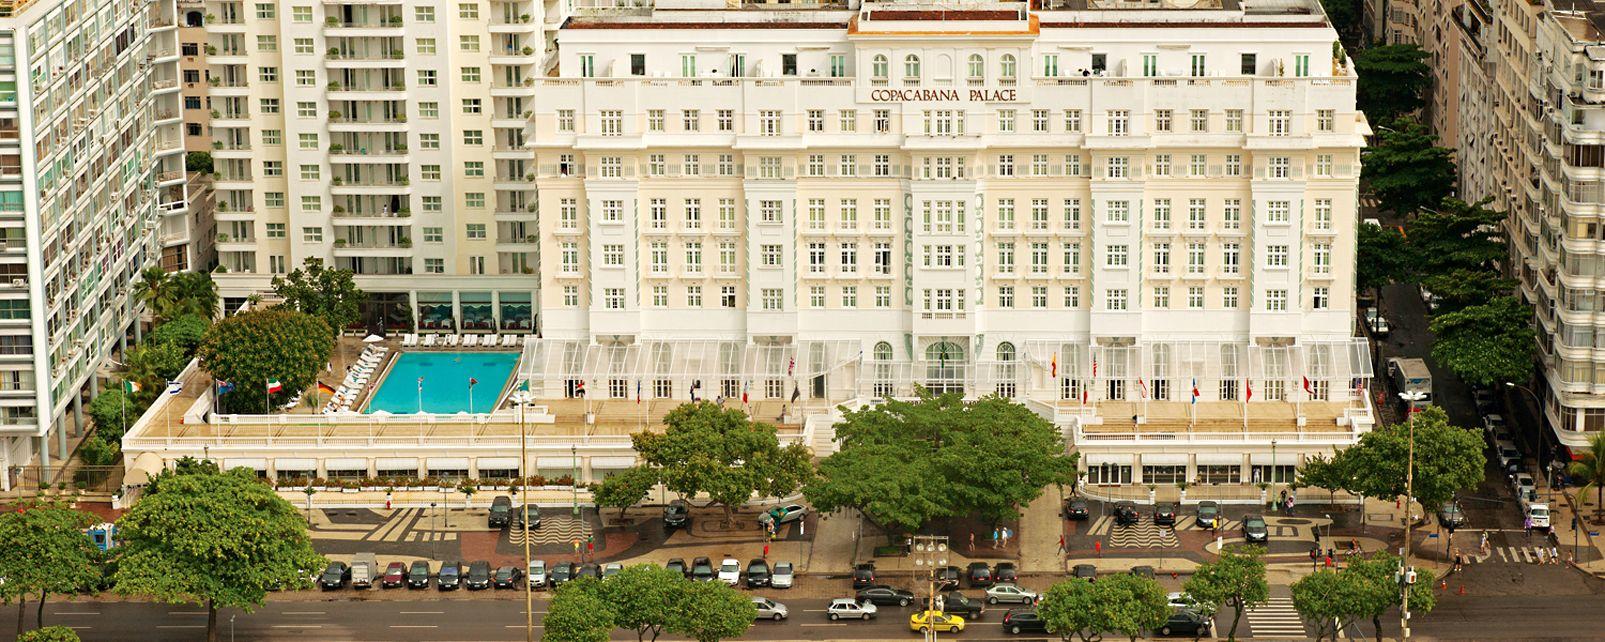 Rio Palace Hotel Rio De Janeiro